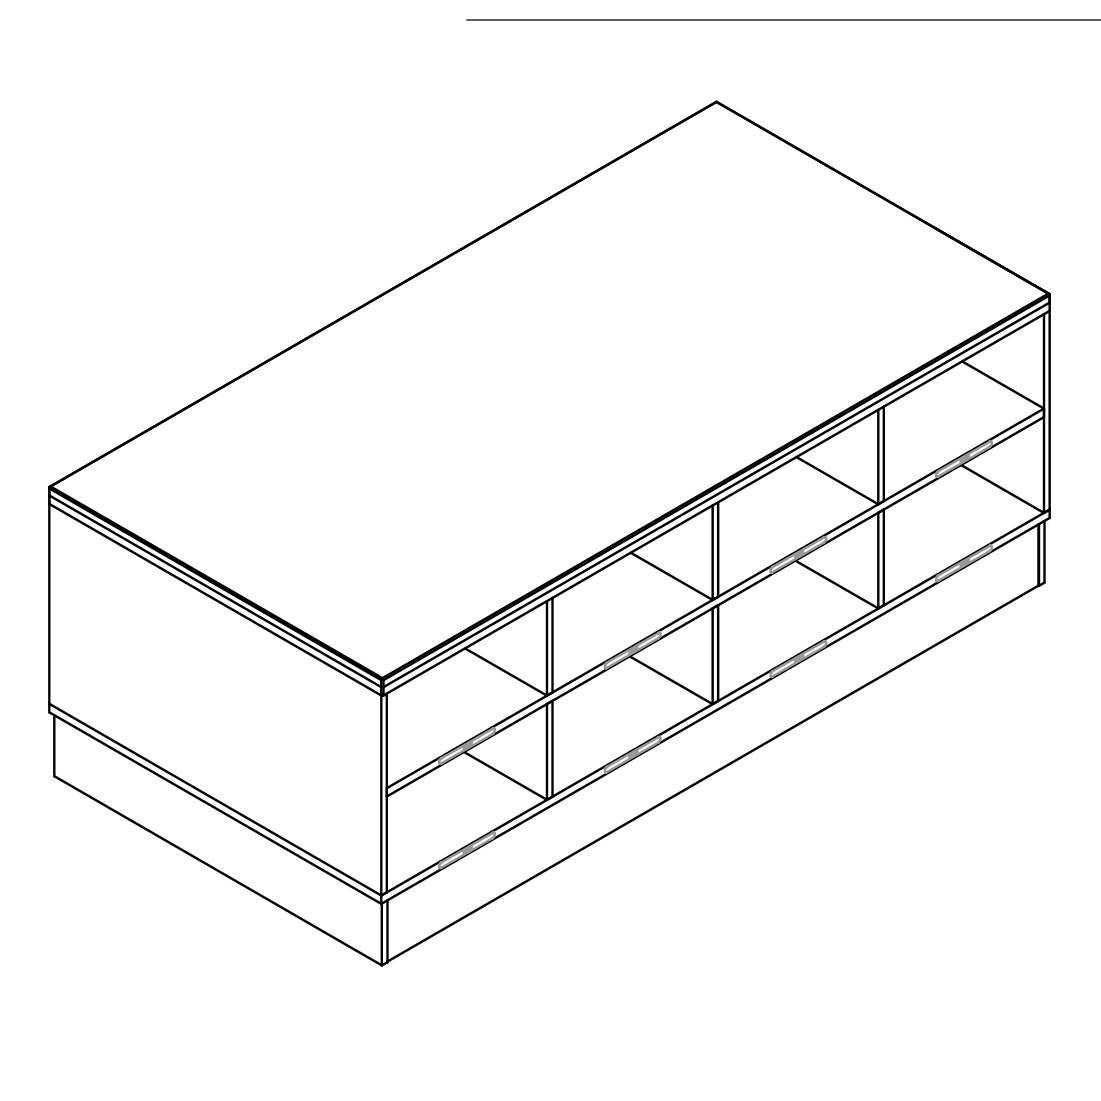 Sit-Over-Bank HPL mit beidseitigen Schuhfächern (2 Ebenen), ArtNr.: HPL_SOB_BS2R